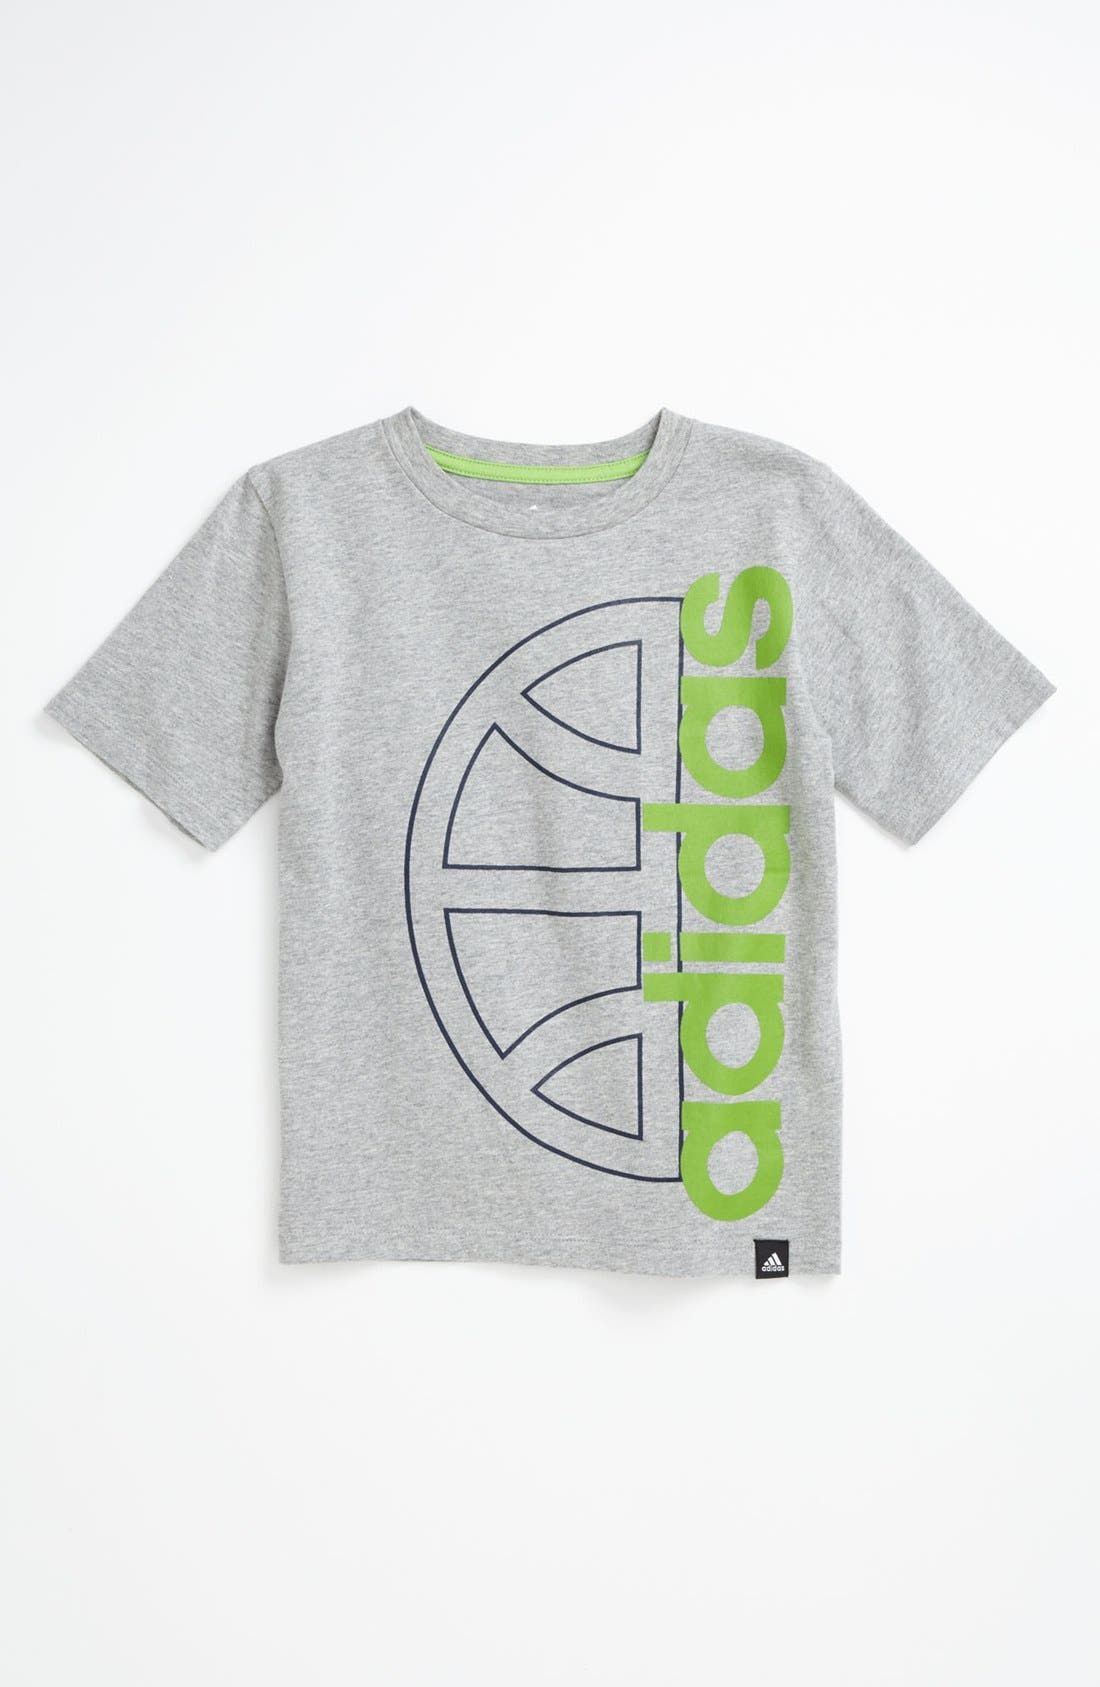 Main Image - adidas 'Ballin' T-Shirt (Little Boys)